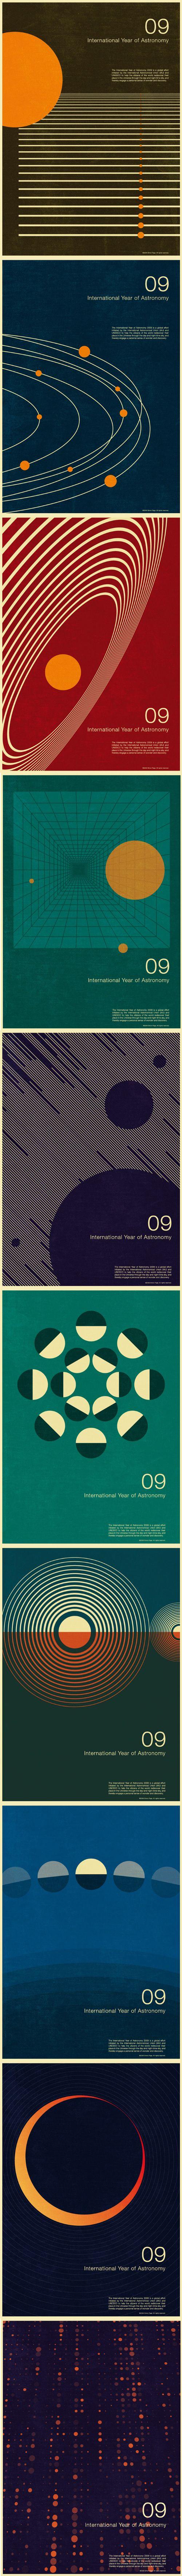 International Year of Astronomy print series, Simon C Page, 2009